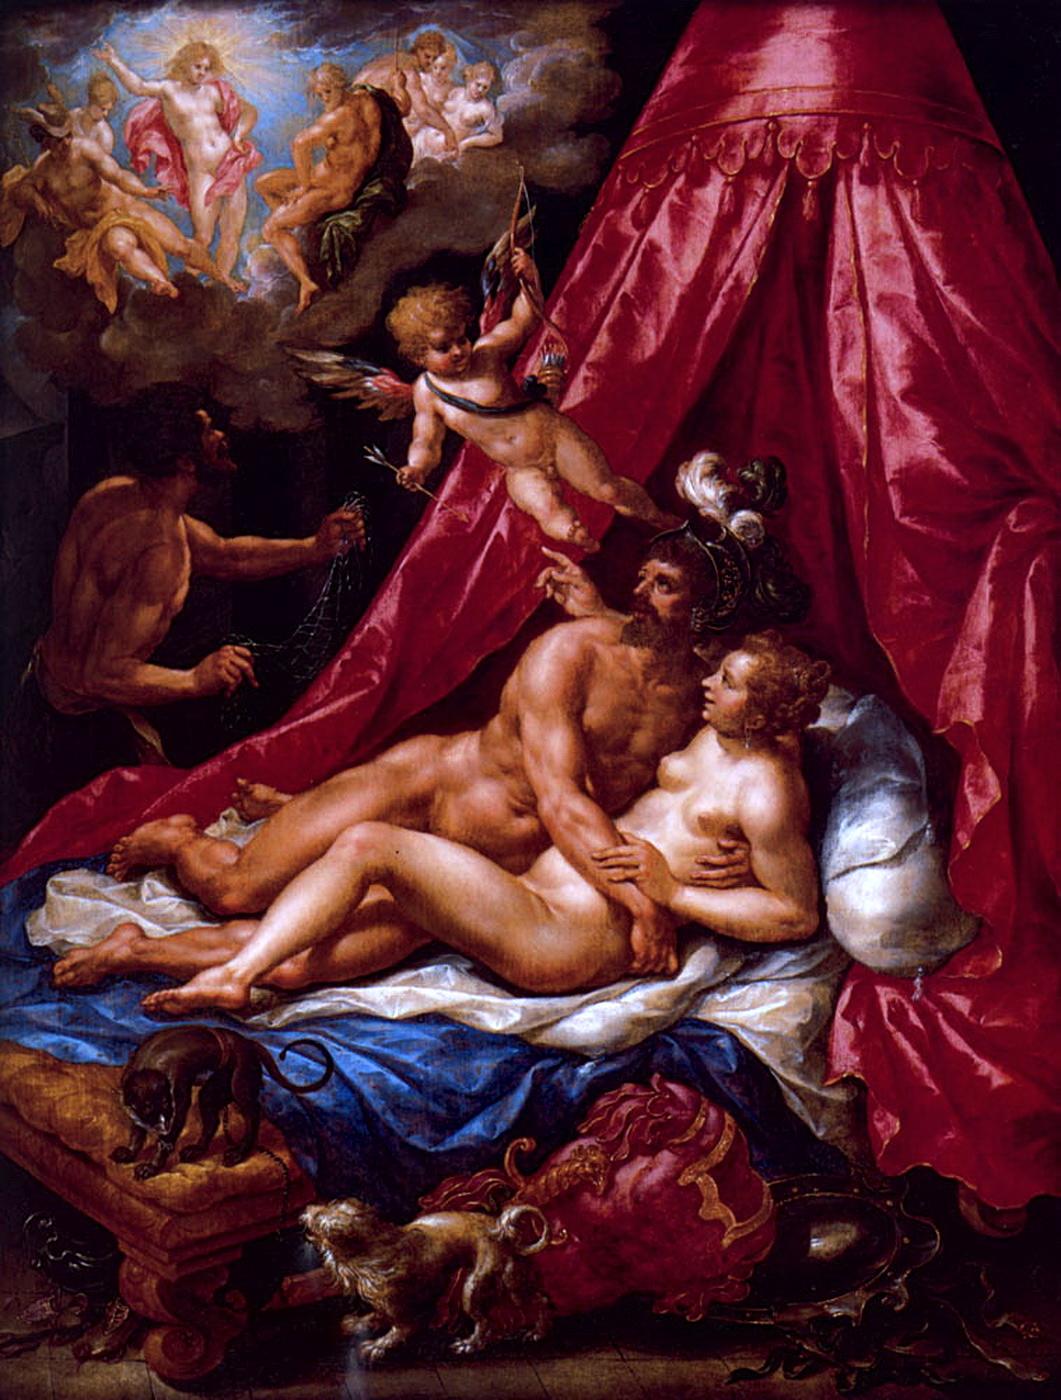 Mars_and_Venus_surprised_by_Apollo_-_Hendrik_de_Clerck_(1615).jpg